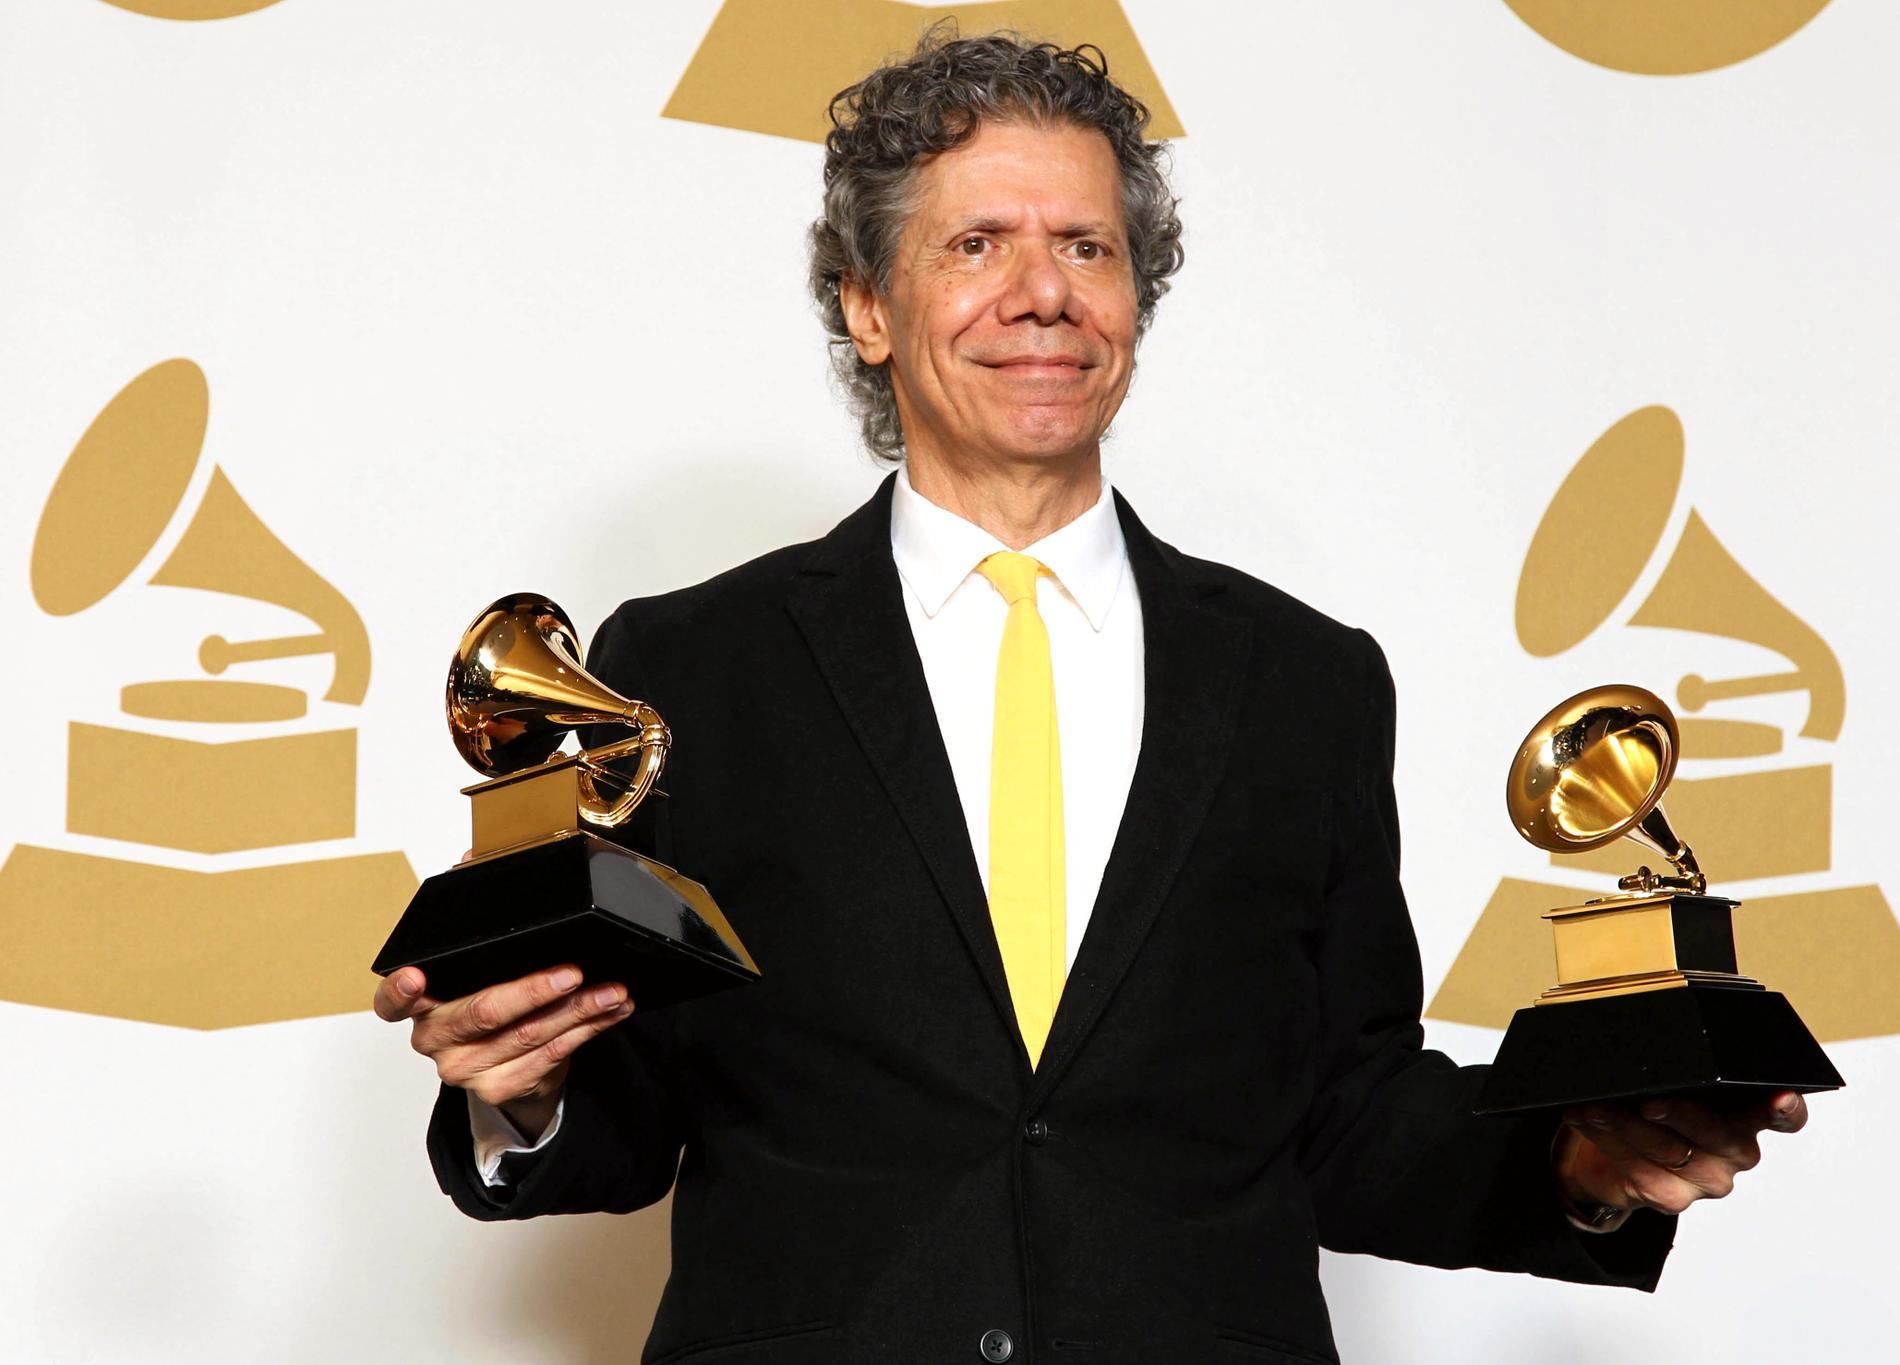 Chick Corea med två av sina Grammypriser 2015.